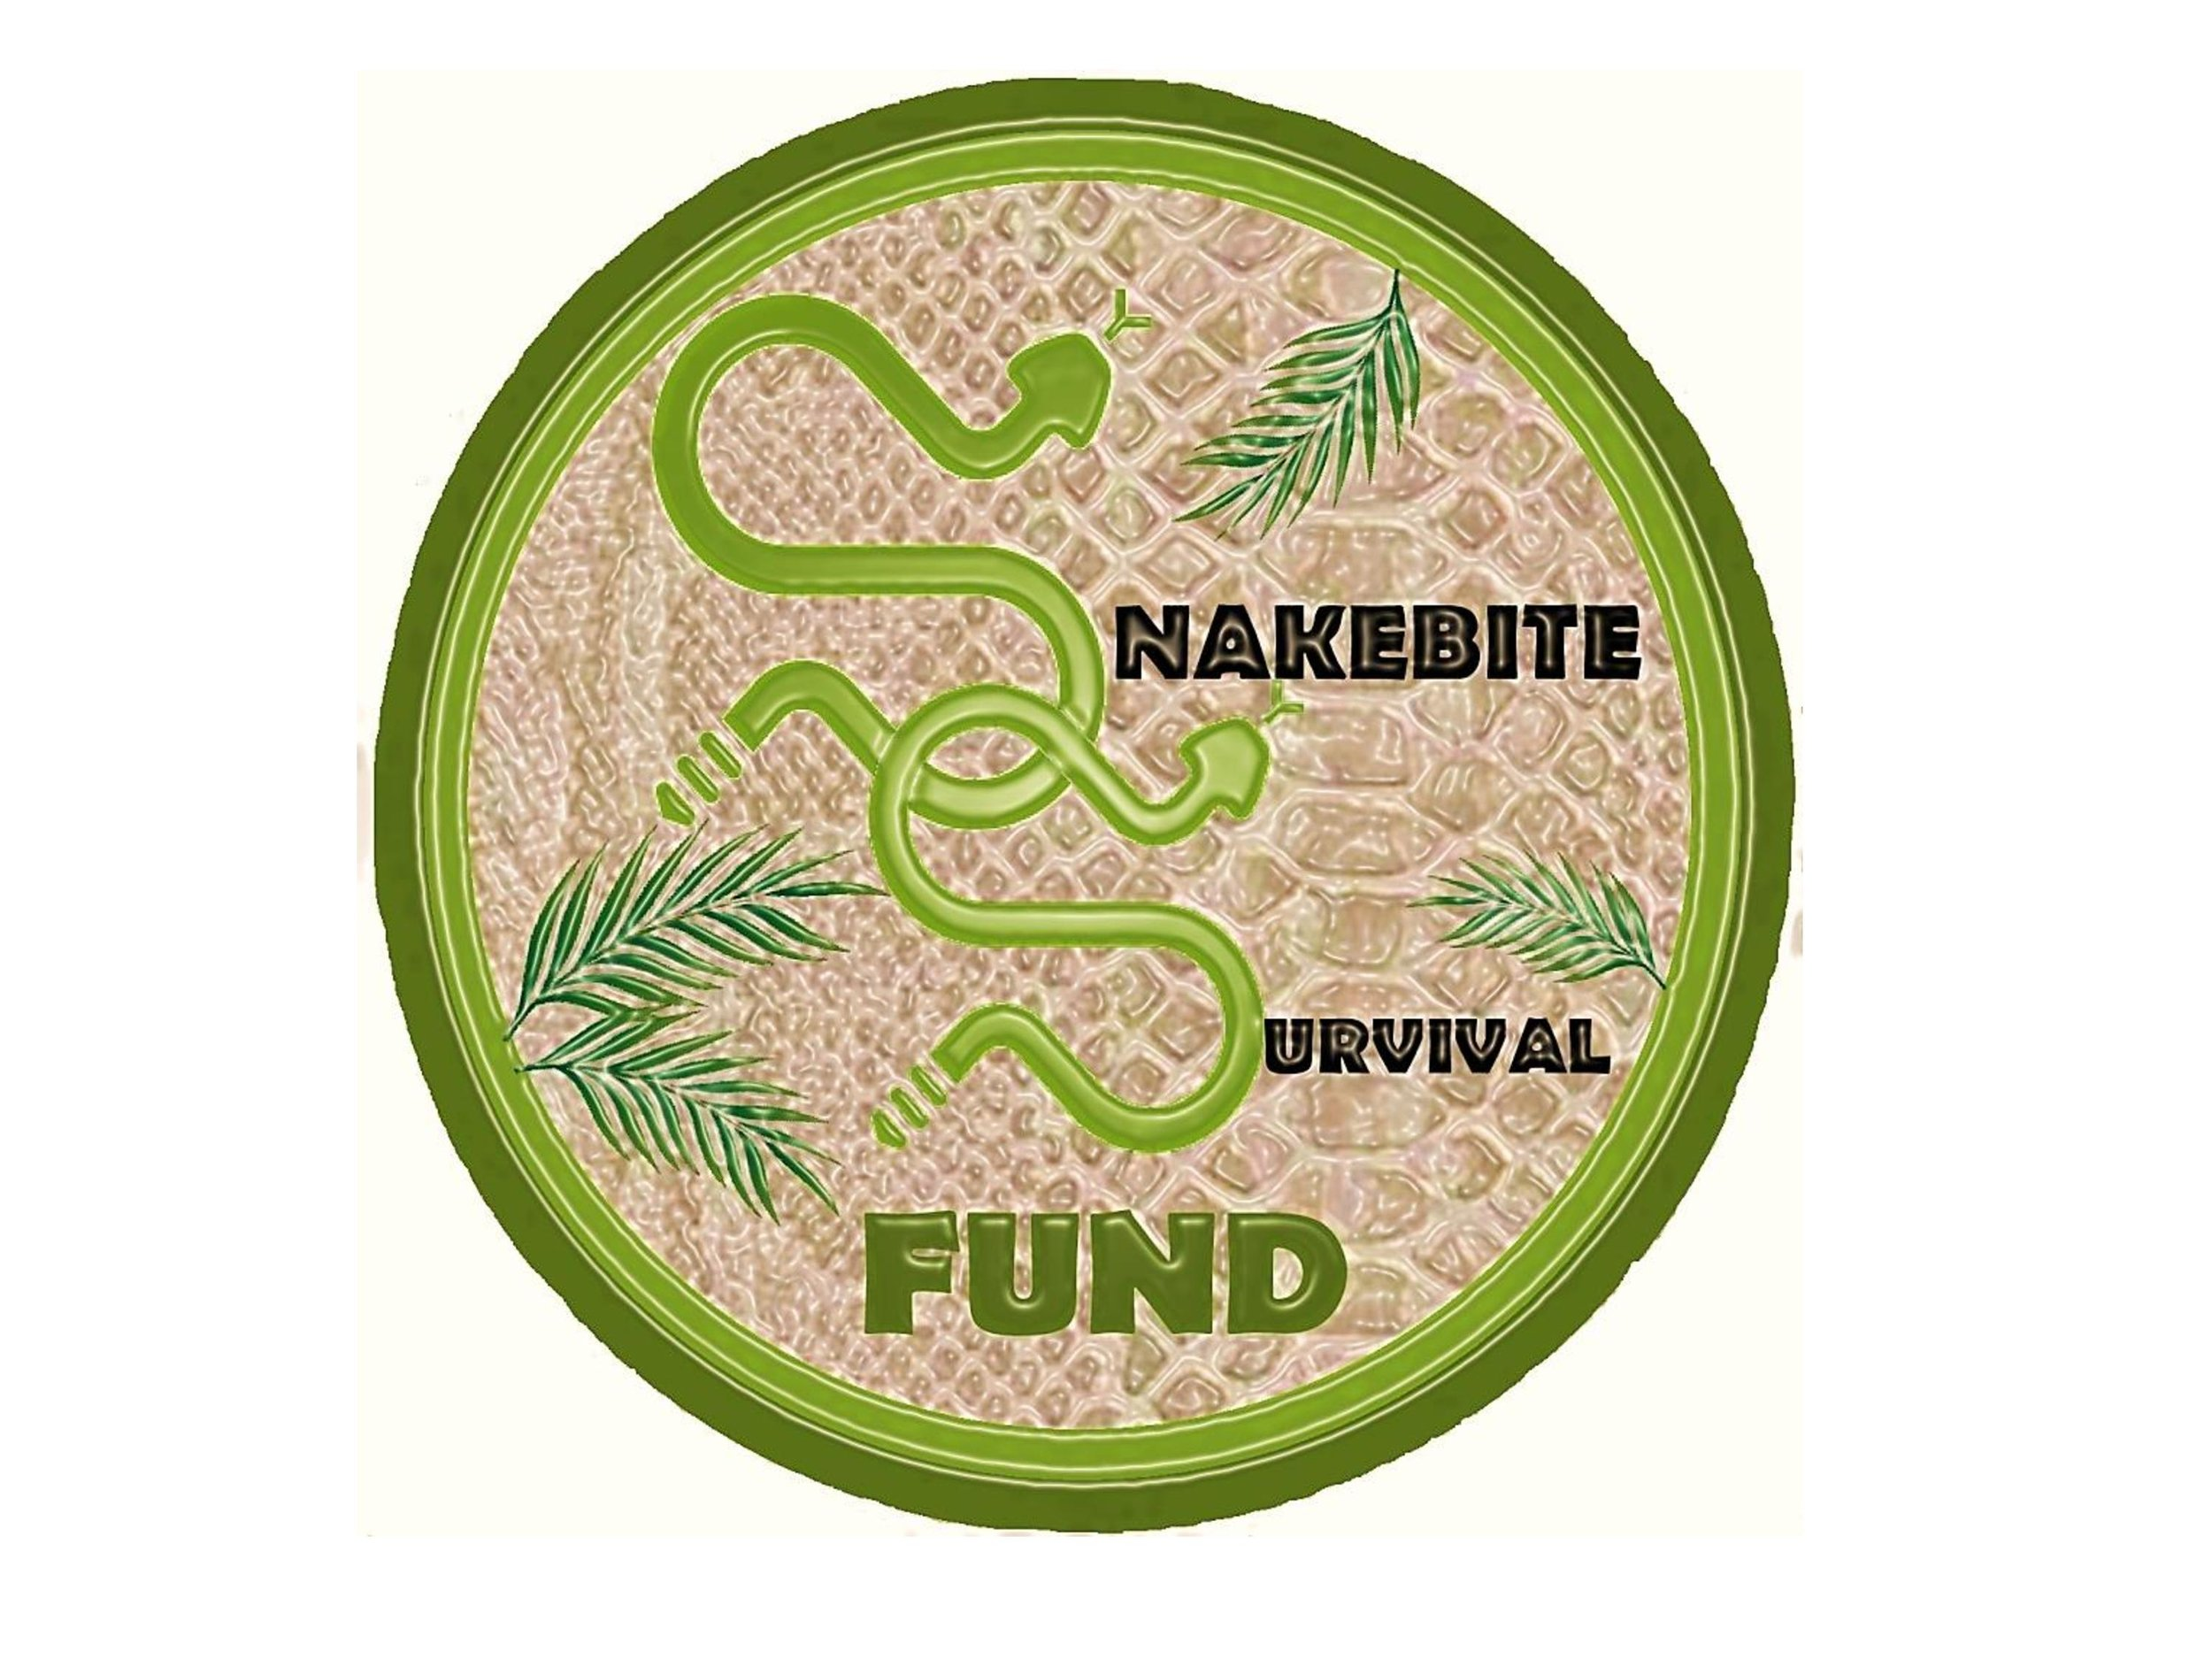 logo def snakebit-page-001.jpg